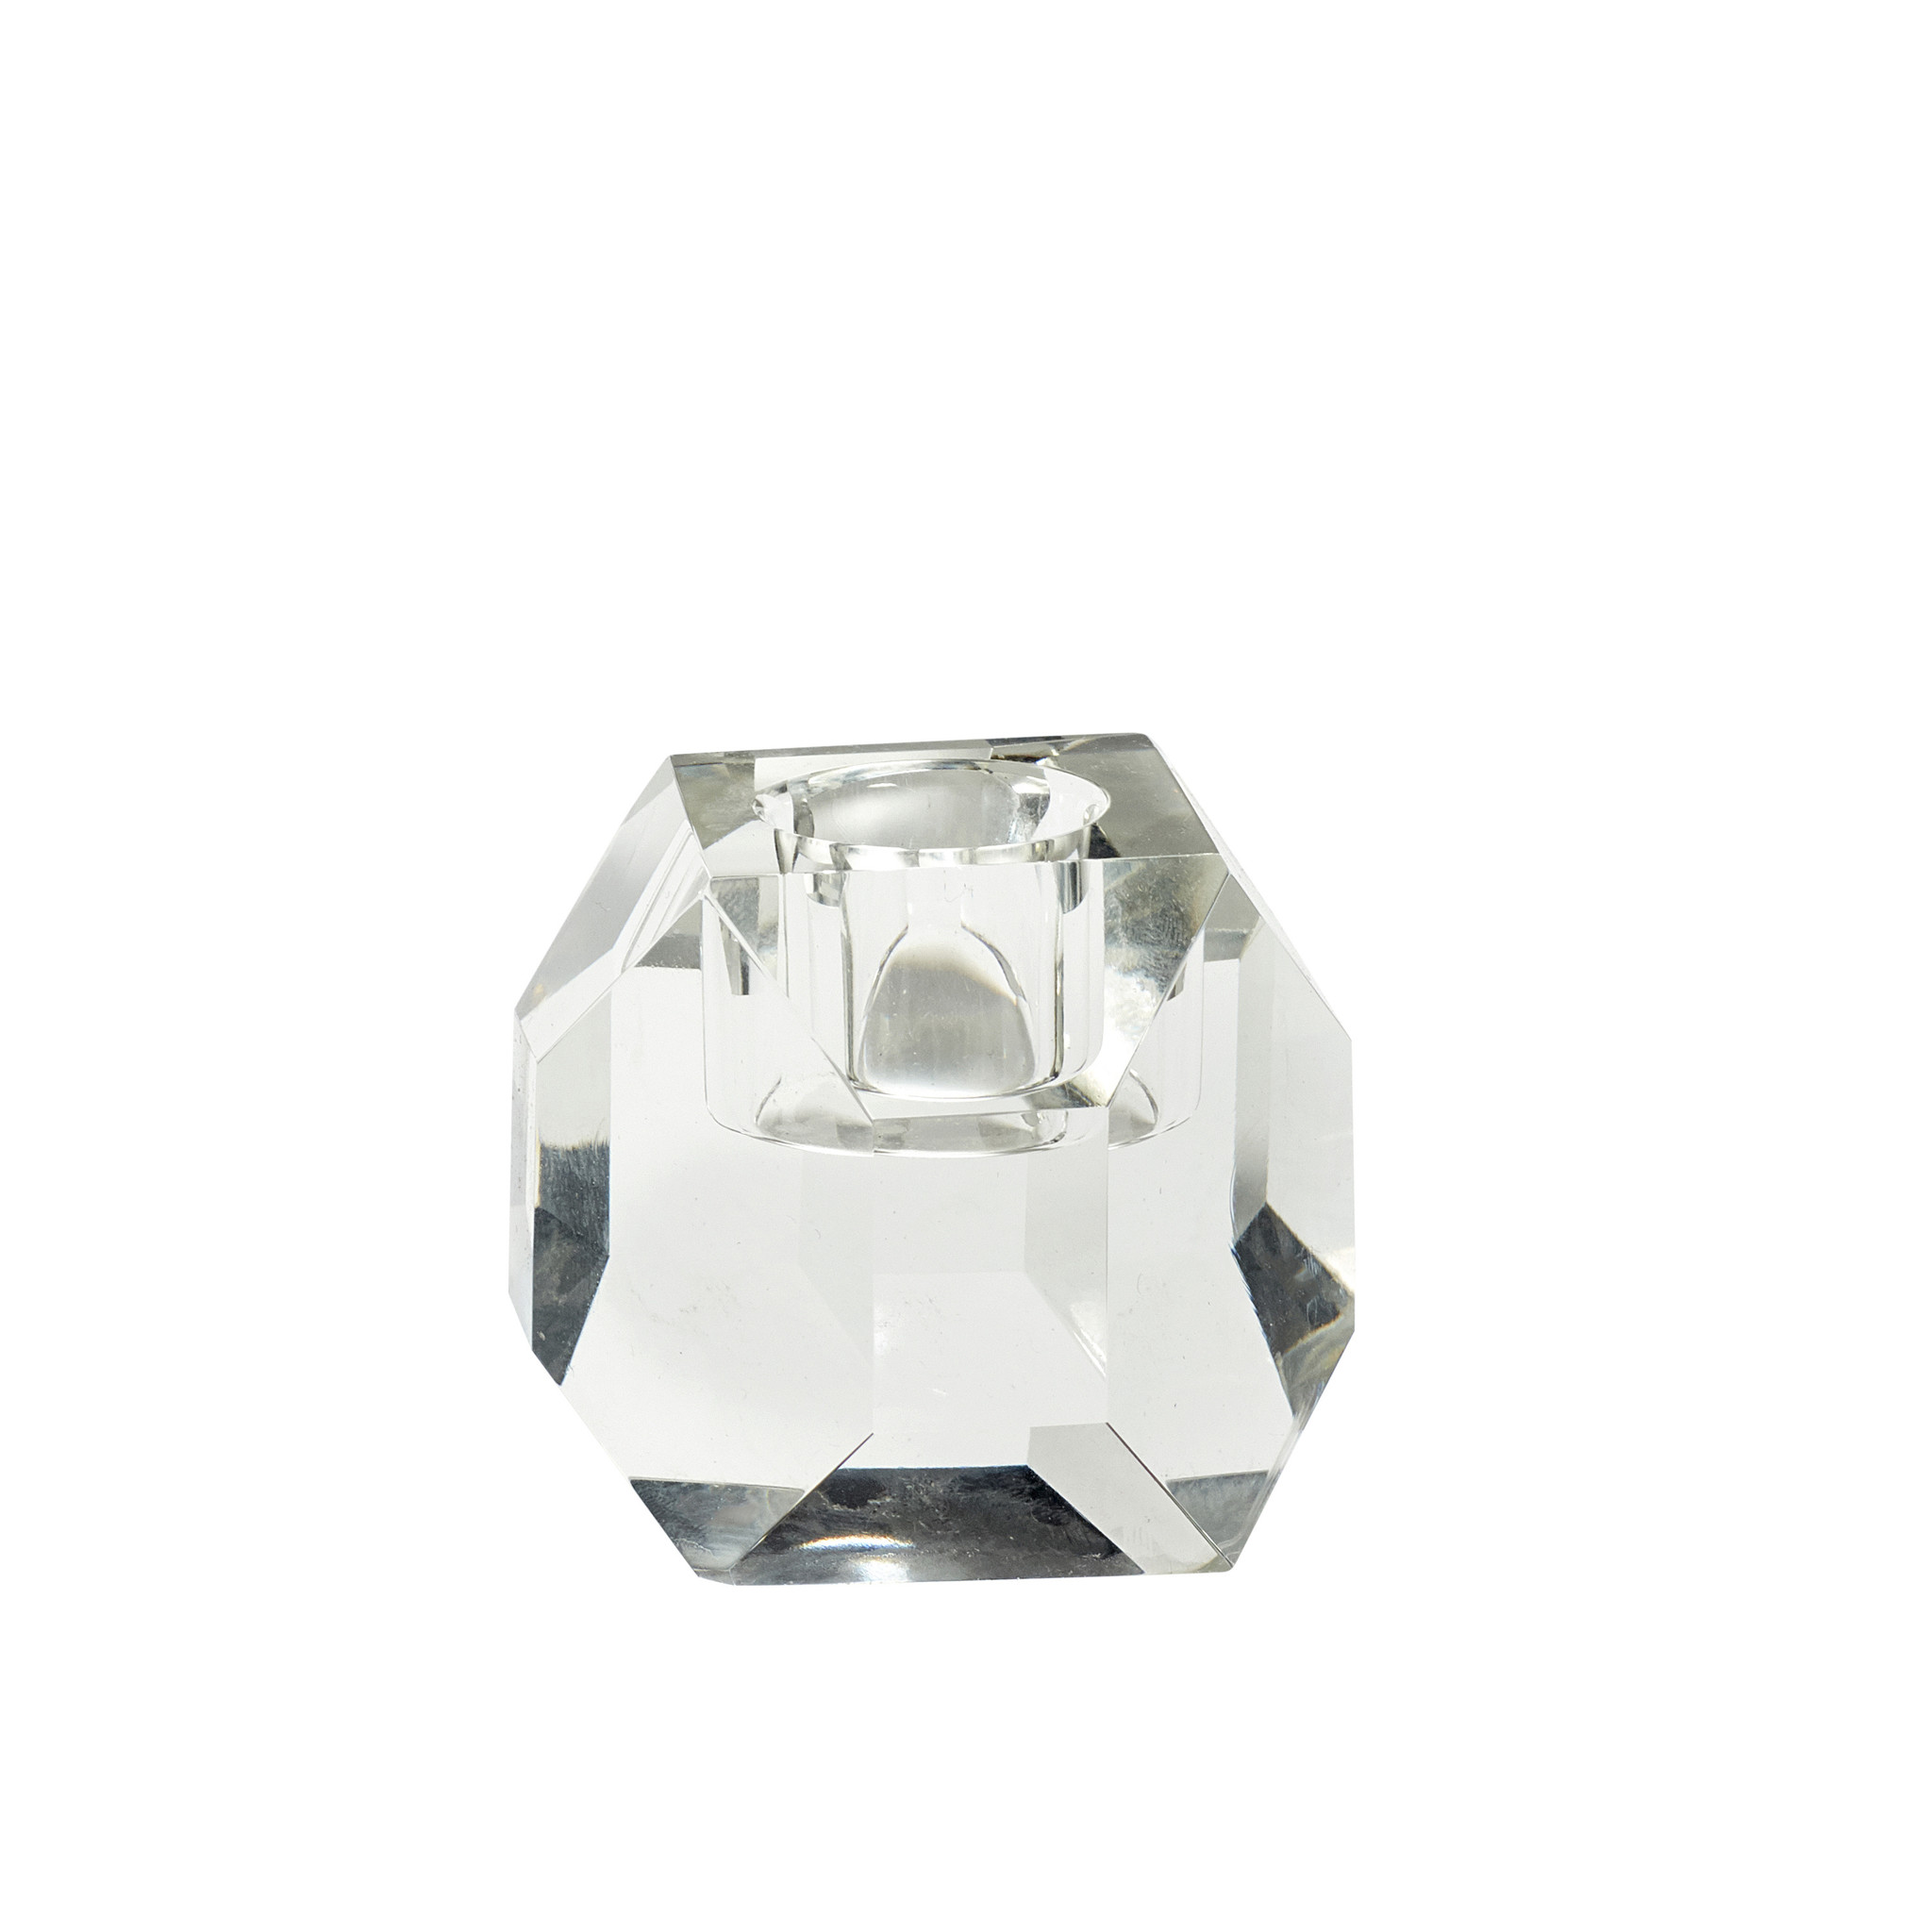 Hubsch Kandelaar, glas, helder-640505-5712772062579